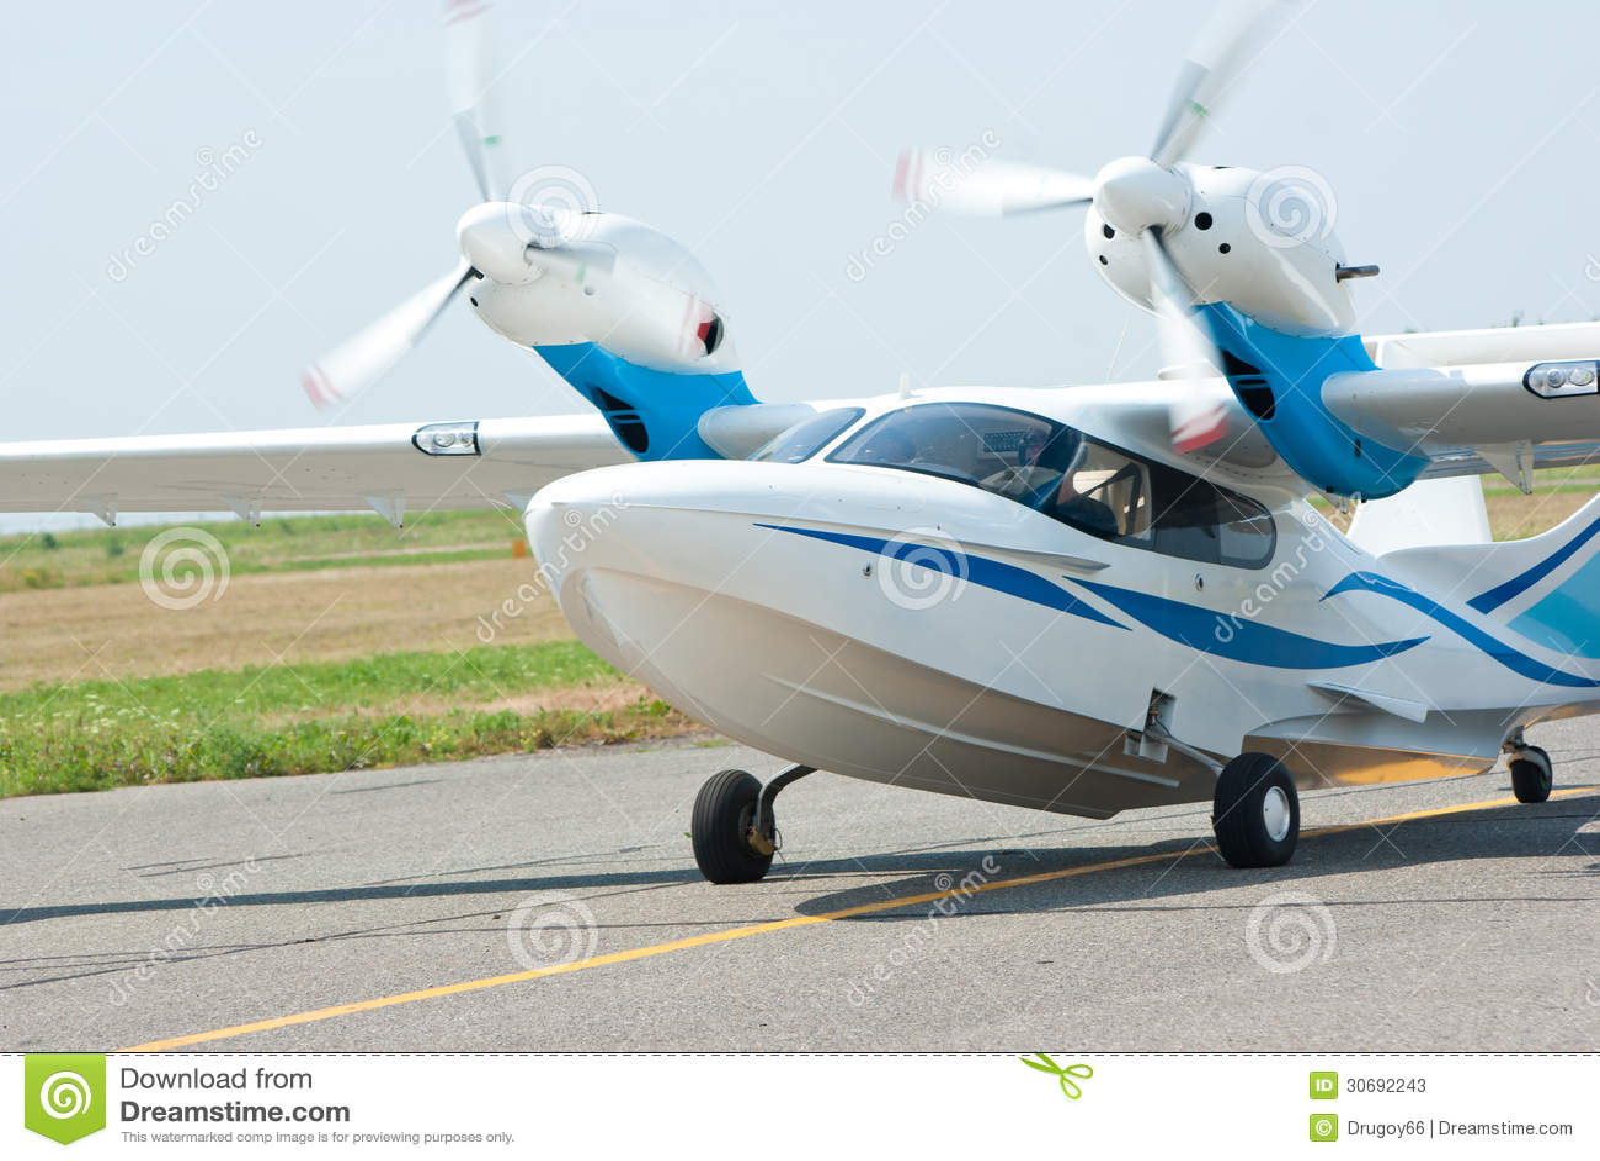 Landing Small Seaplane Stock Photos - Image: 30692243